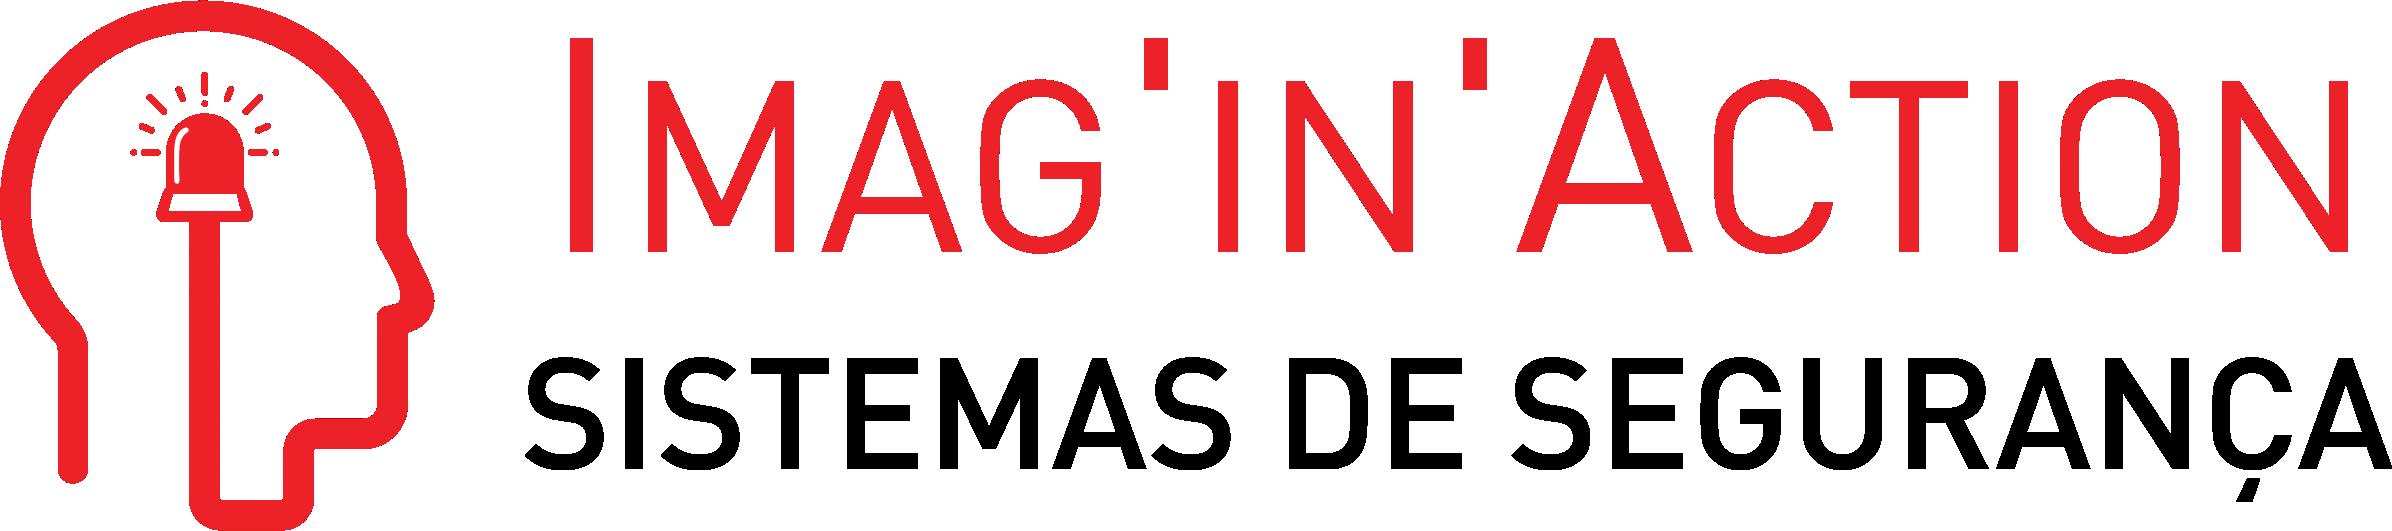 Imag'in'Action Sistemas de Segurança